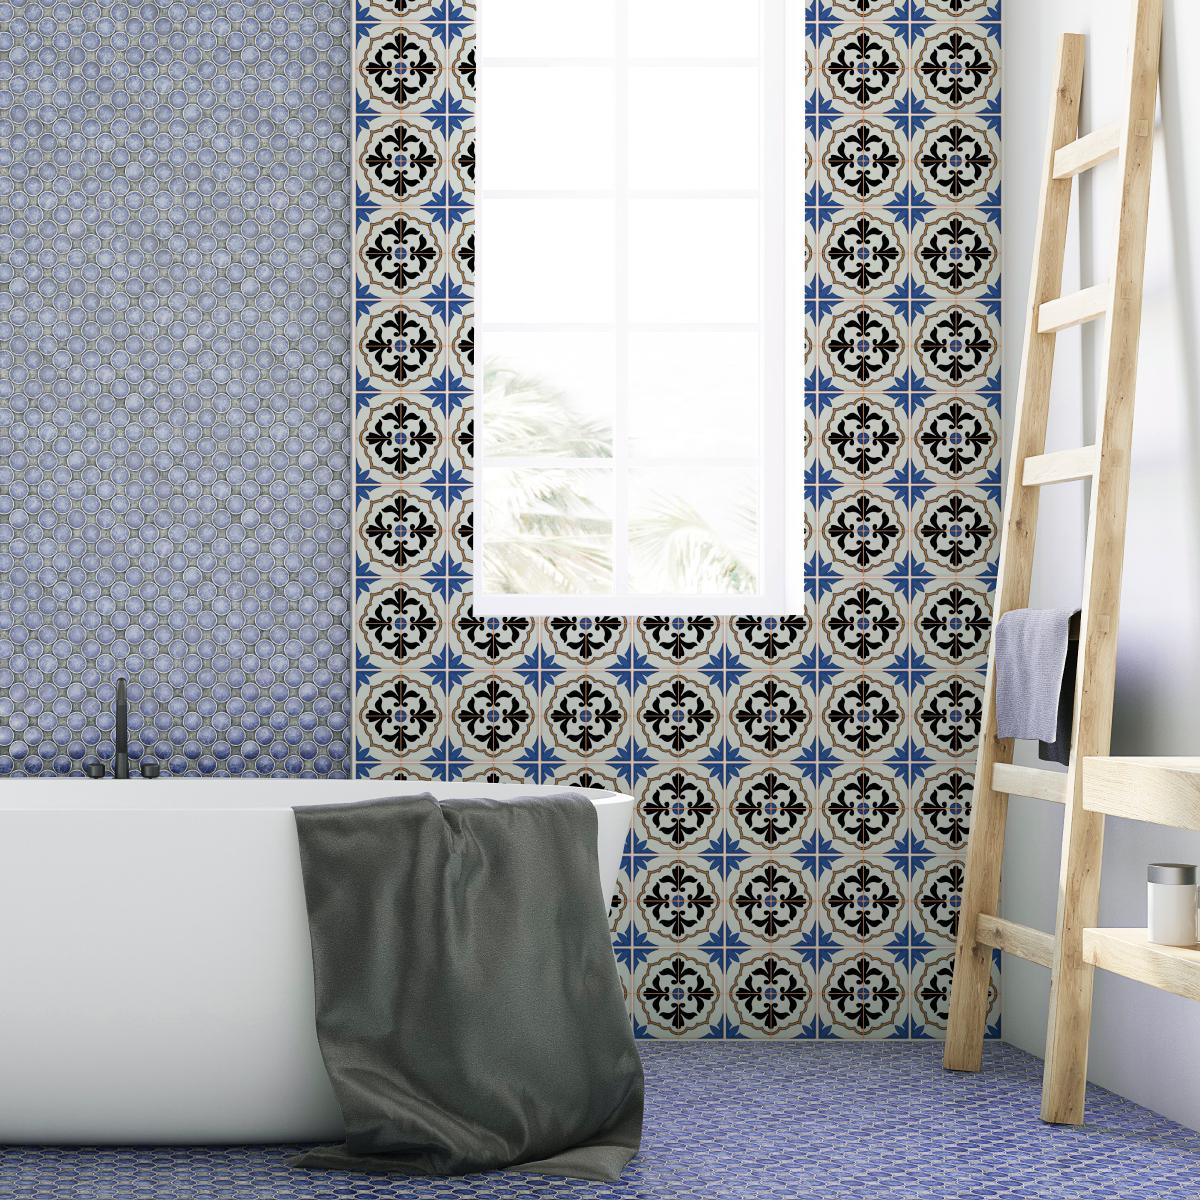 60 stickers carrelages azulejos joao salle de bain et wc. Black Bedroom Furniture Sets. Home Design Ideas